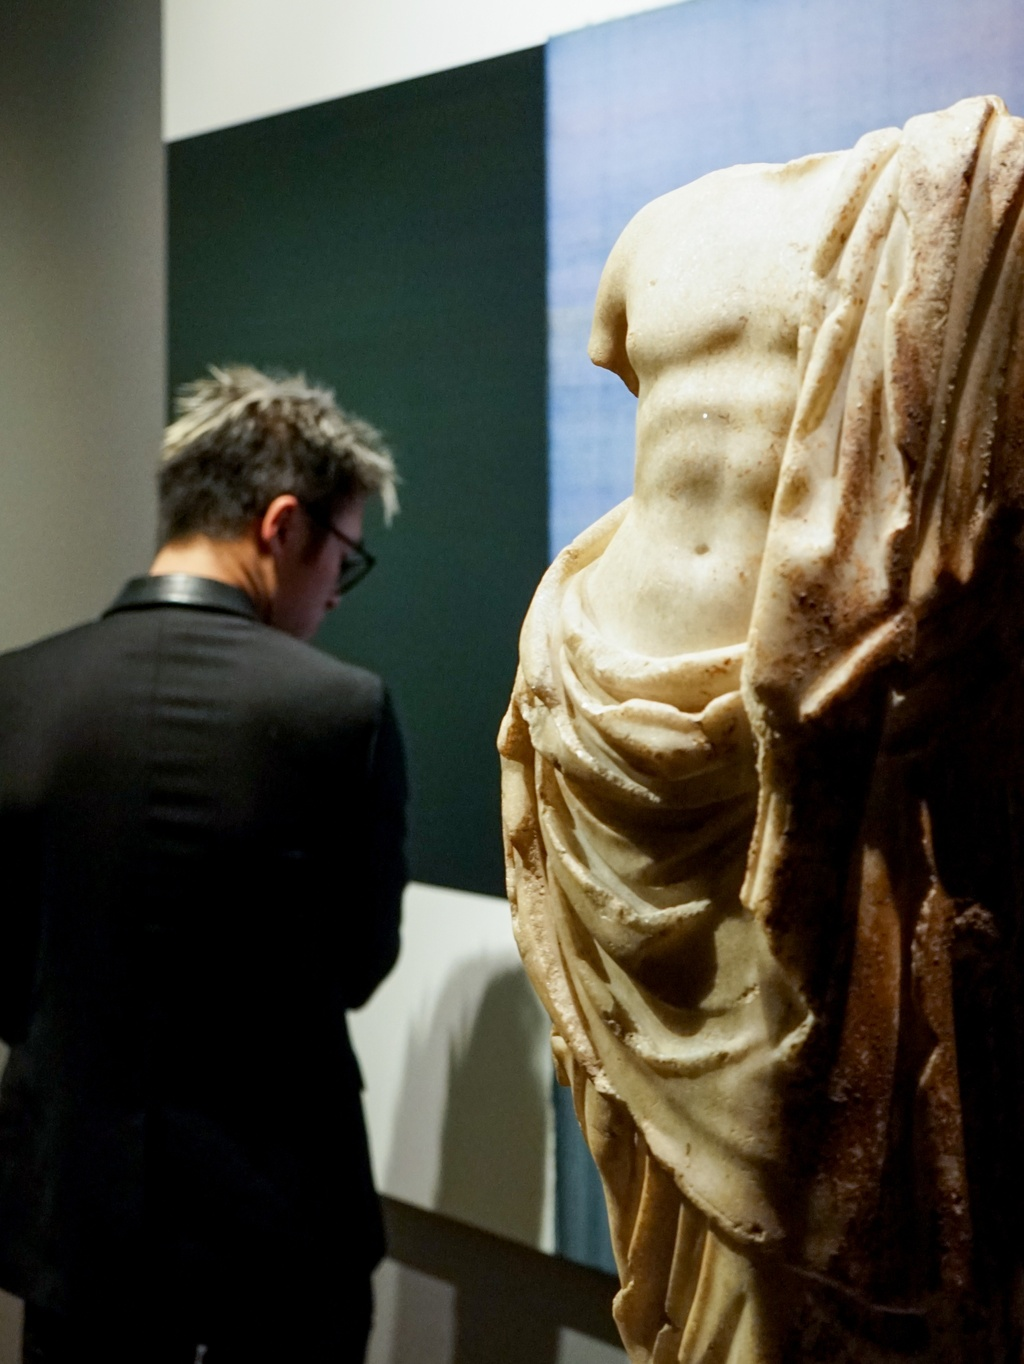 marble sculpture in art gallery